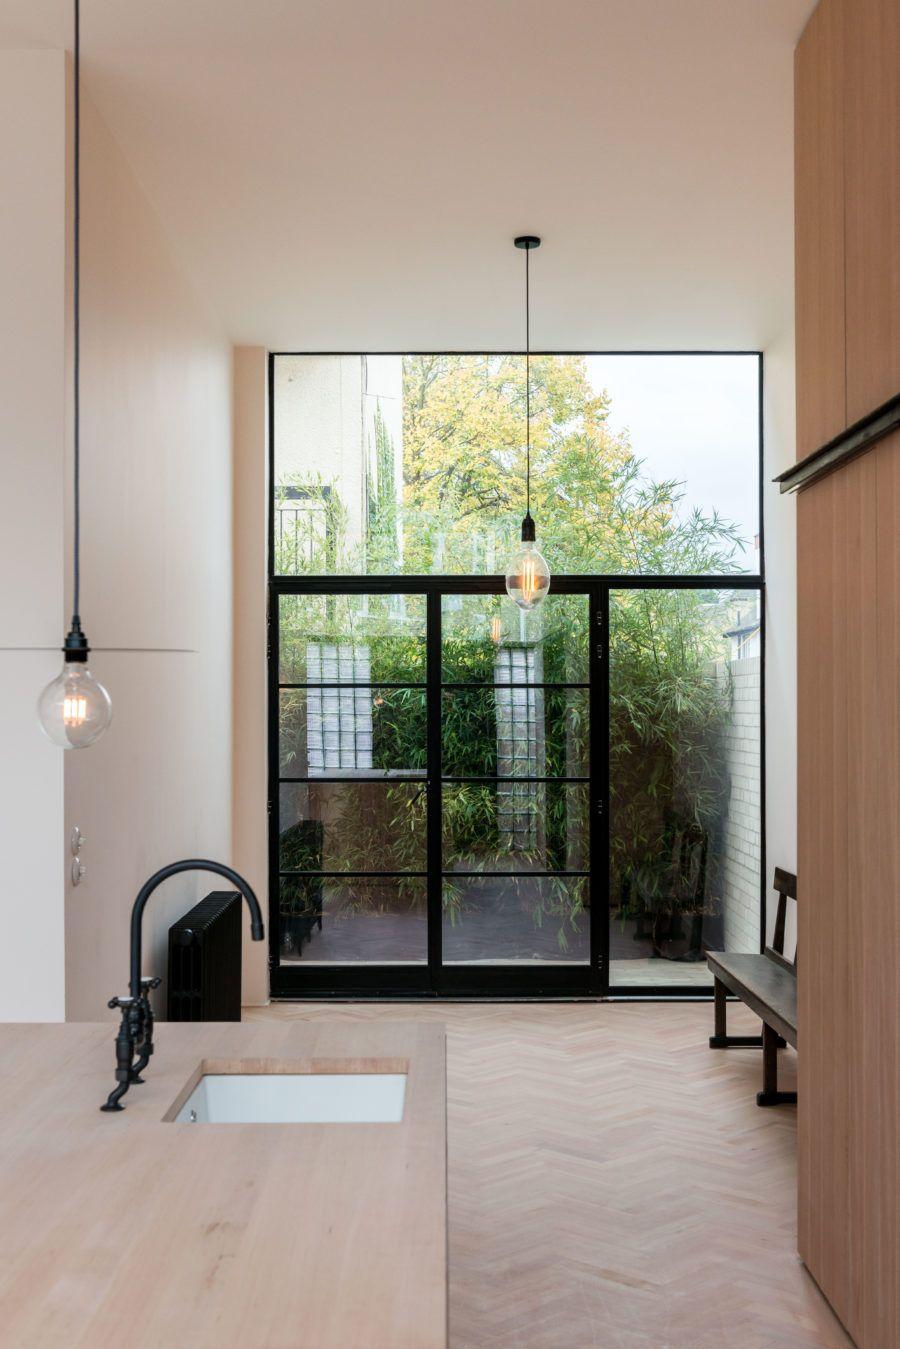 imperial-club-frame-property-london-23 | KITCHEN DESIGN | Pinterest ...